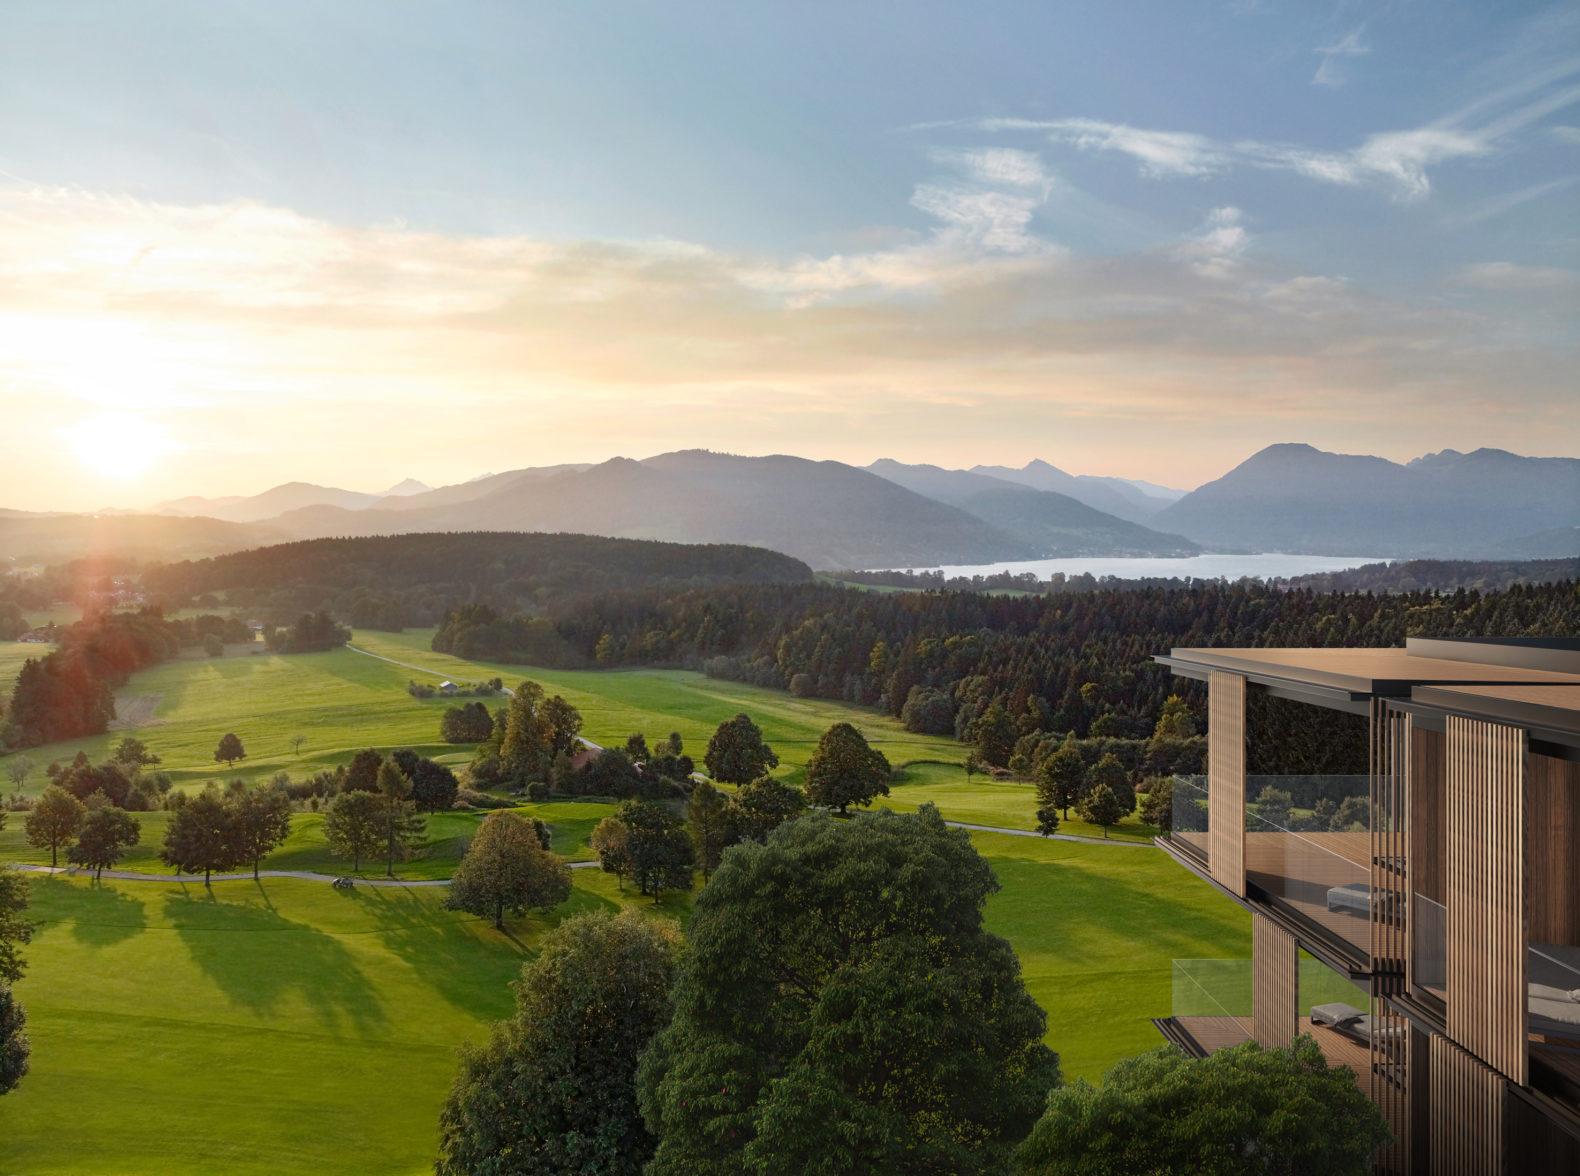 panoramic-view-green-fields-lake-mountain-hills-lanserhof-tegernsee-germany